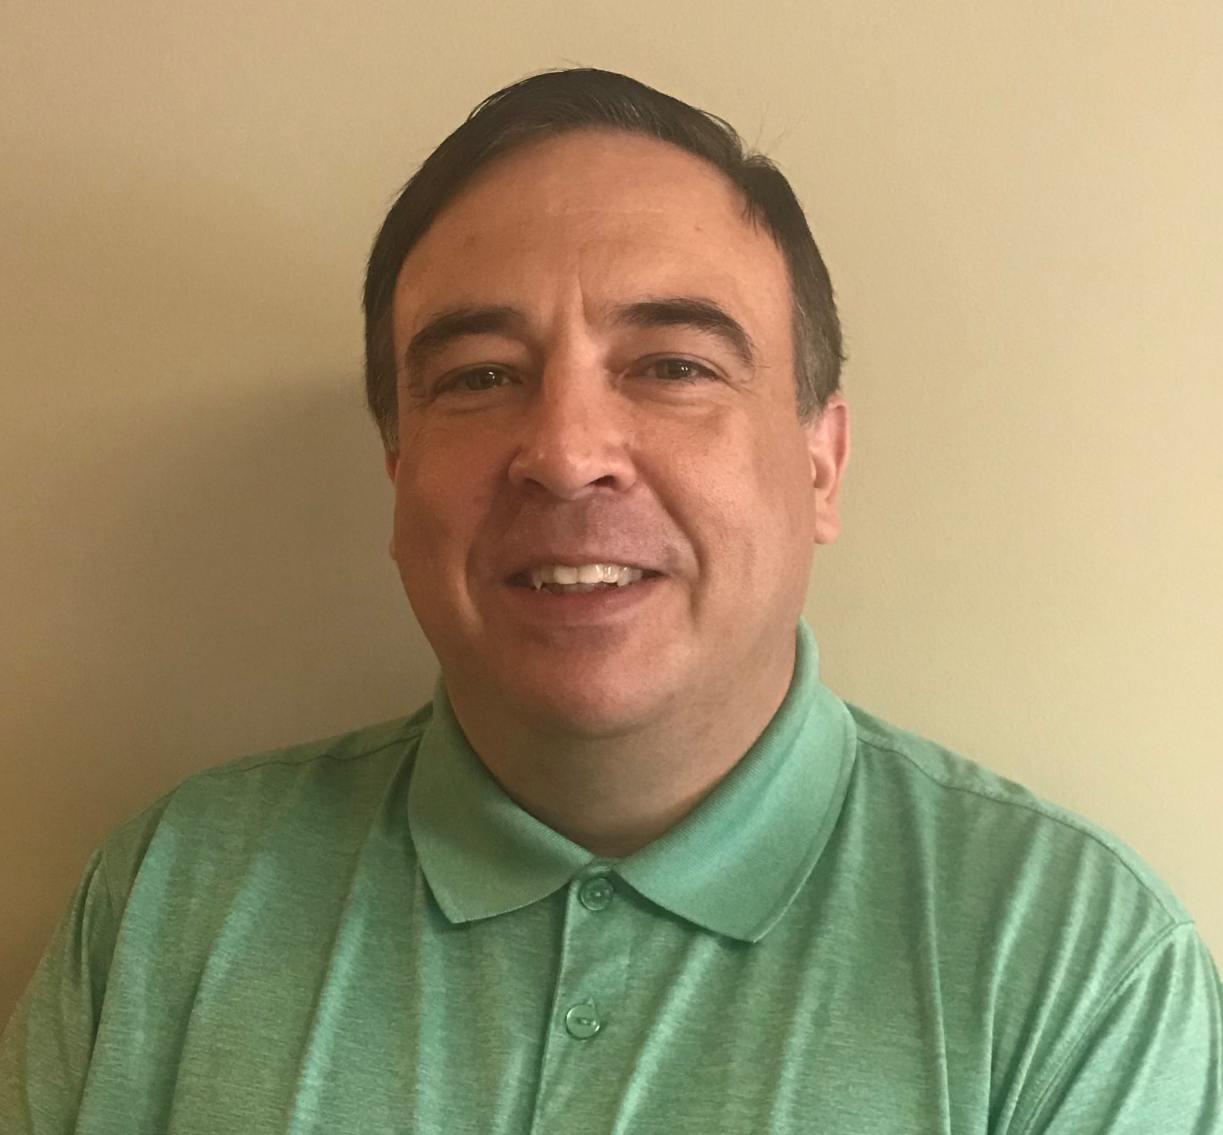 Bell Insurance Solutions' Larry Massey